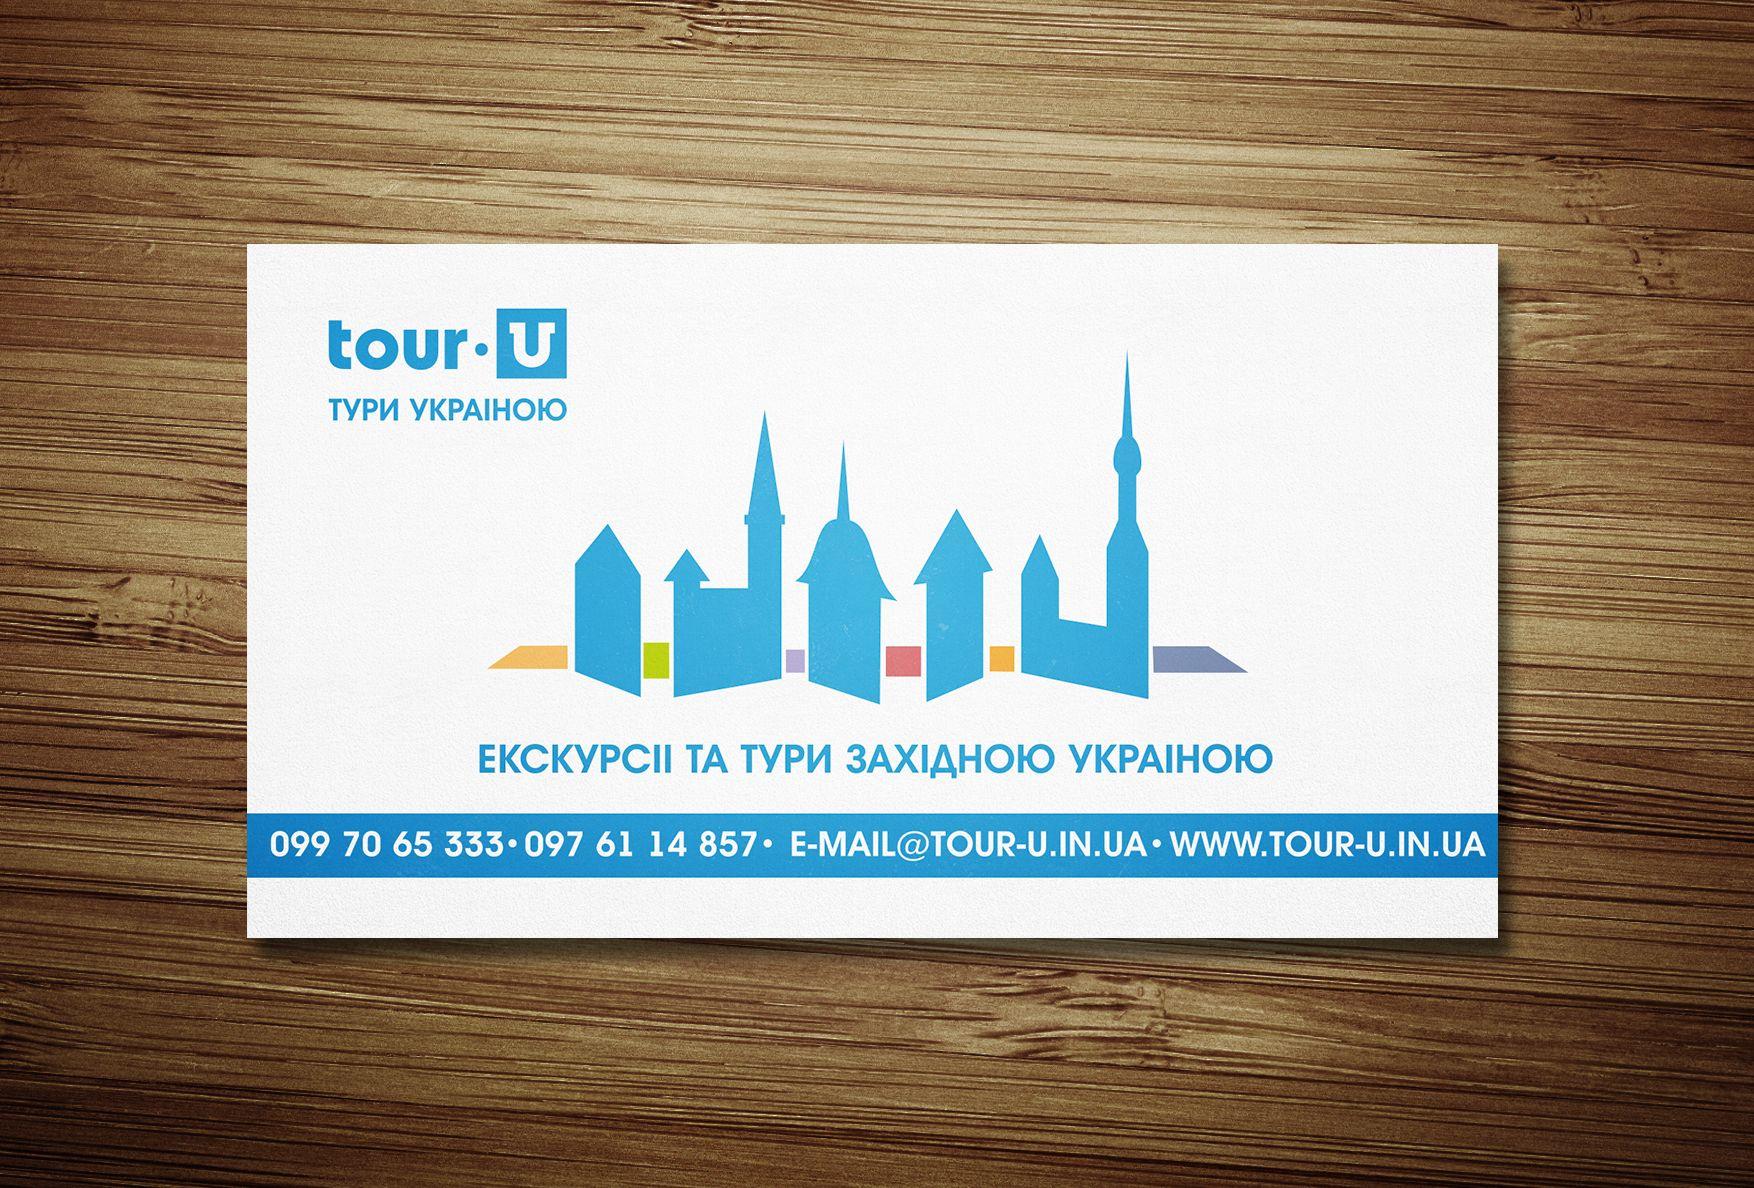 business cards design for travel agency tour ukraine